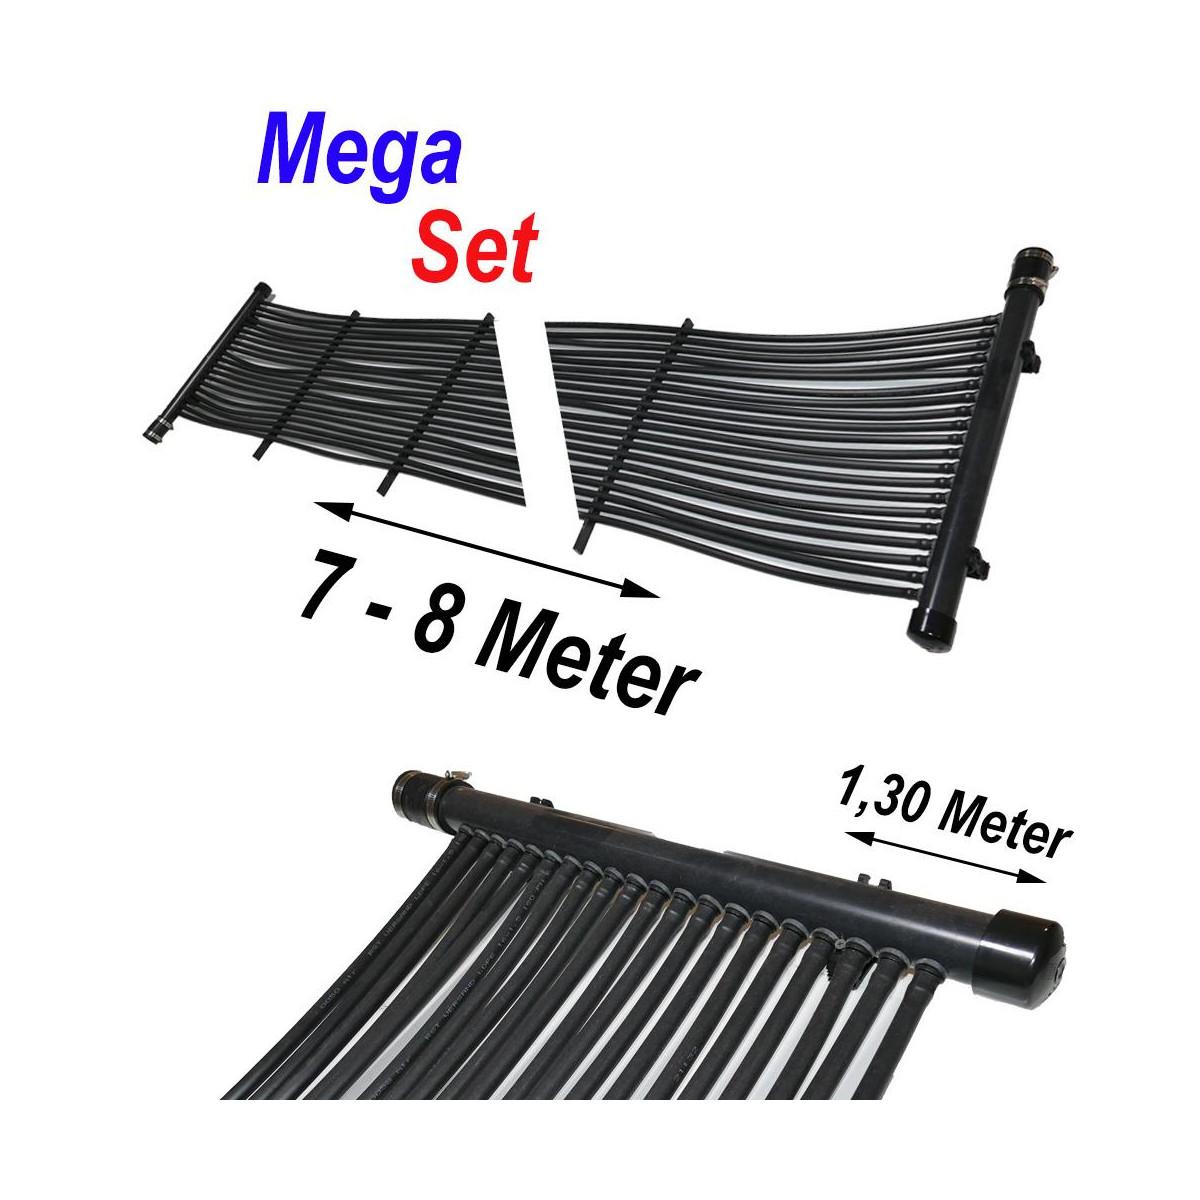 RST-VERSAND (Eigenmarke) Poolheizung Solarmatte MegaSet 9,60 m² (320 Meter)